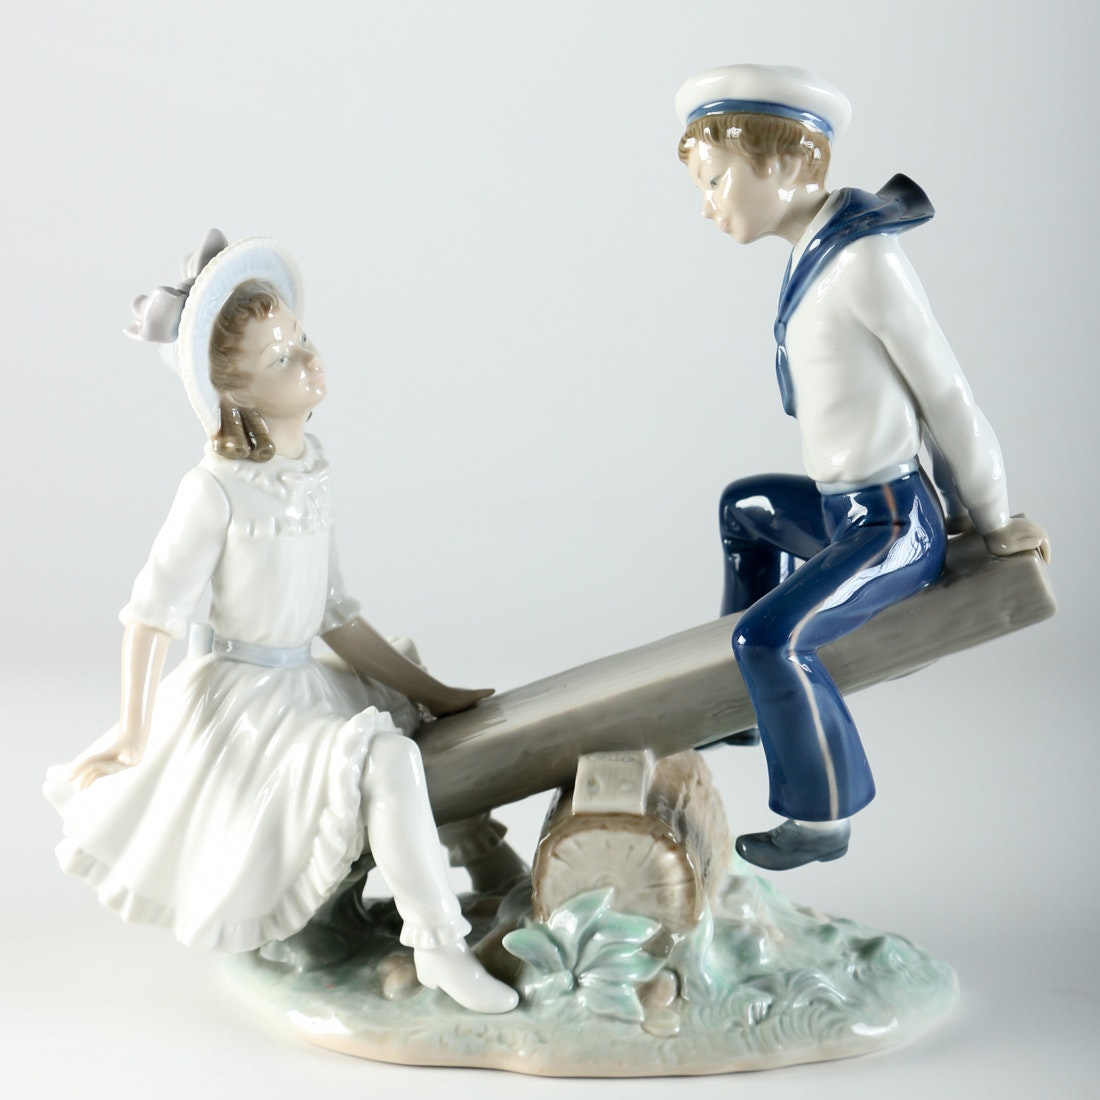 Lladro Figurine of Children on a SeeSaw